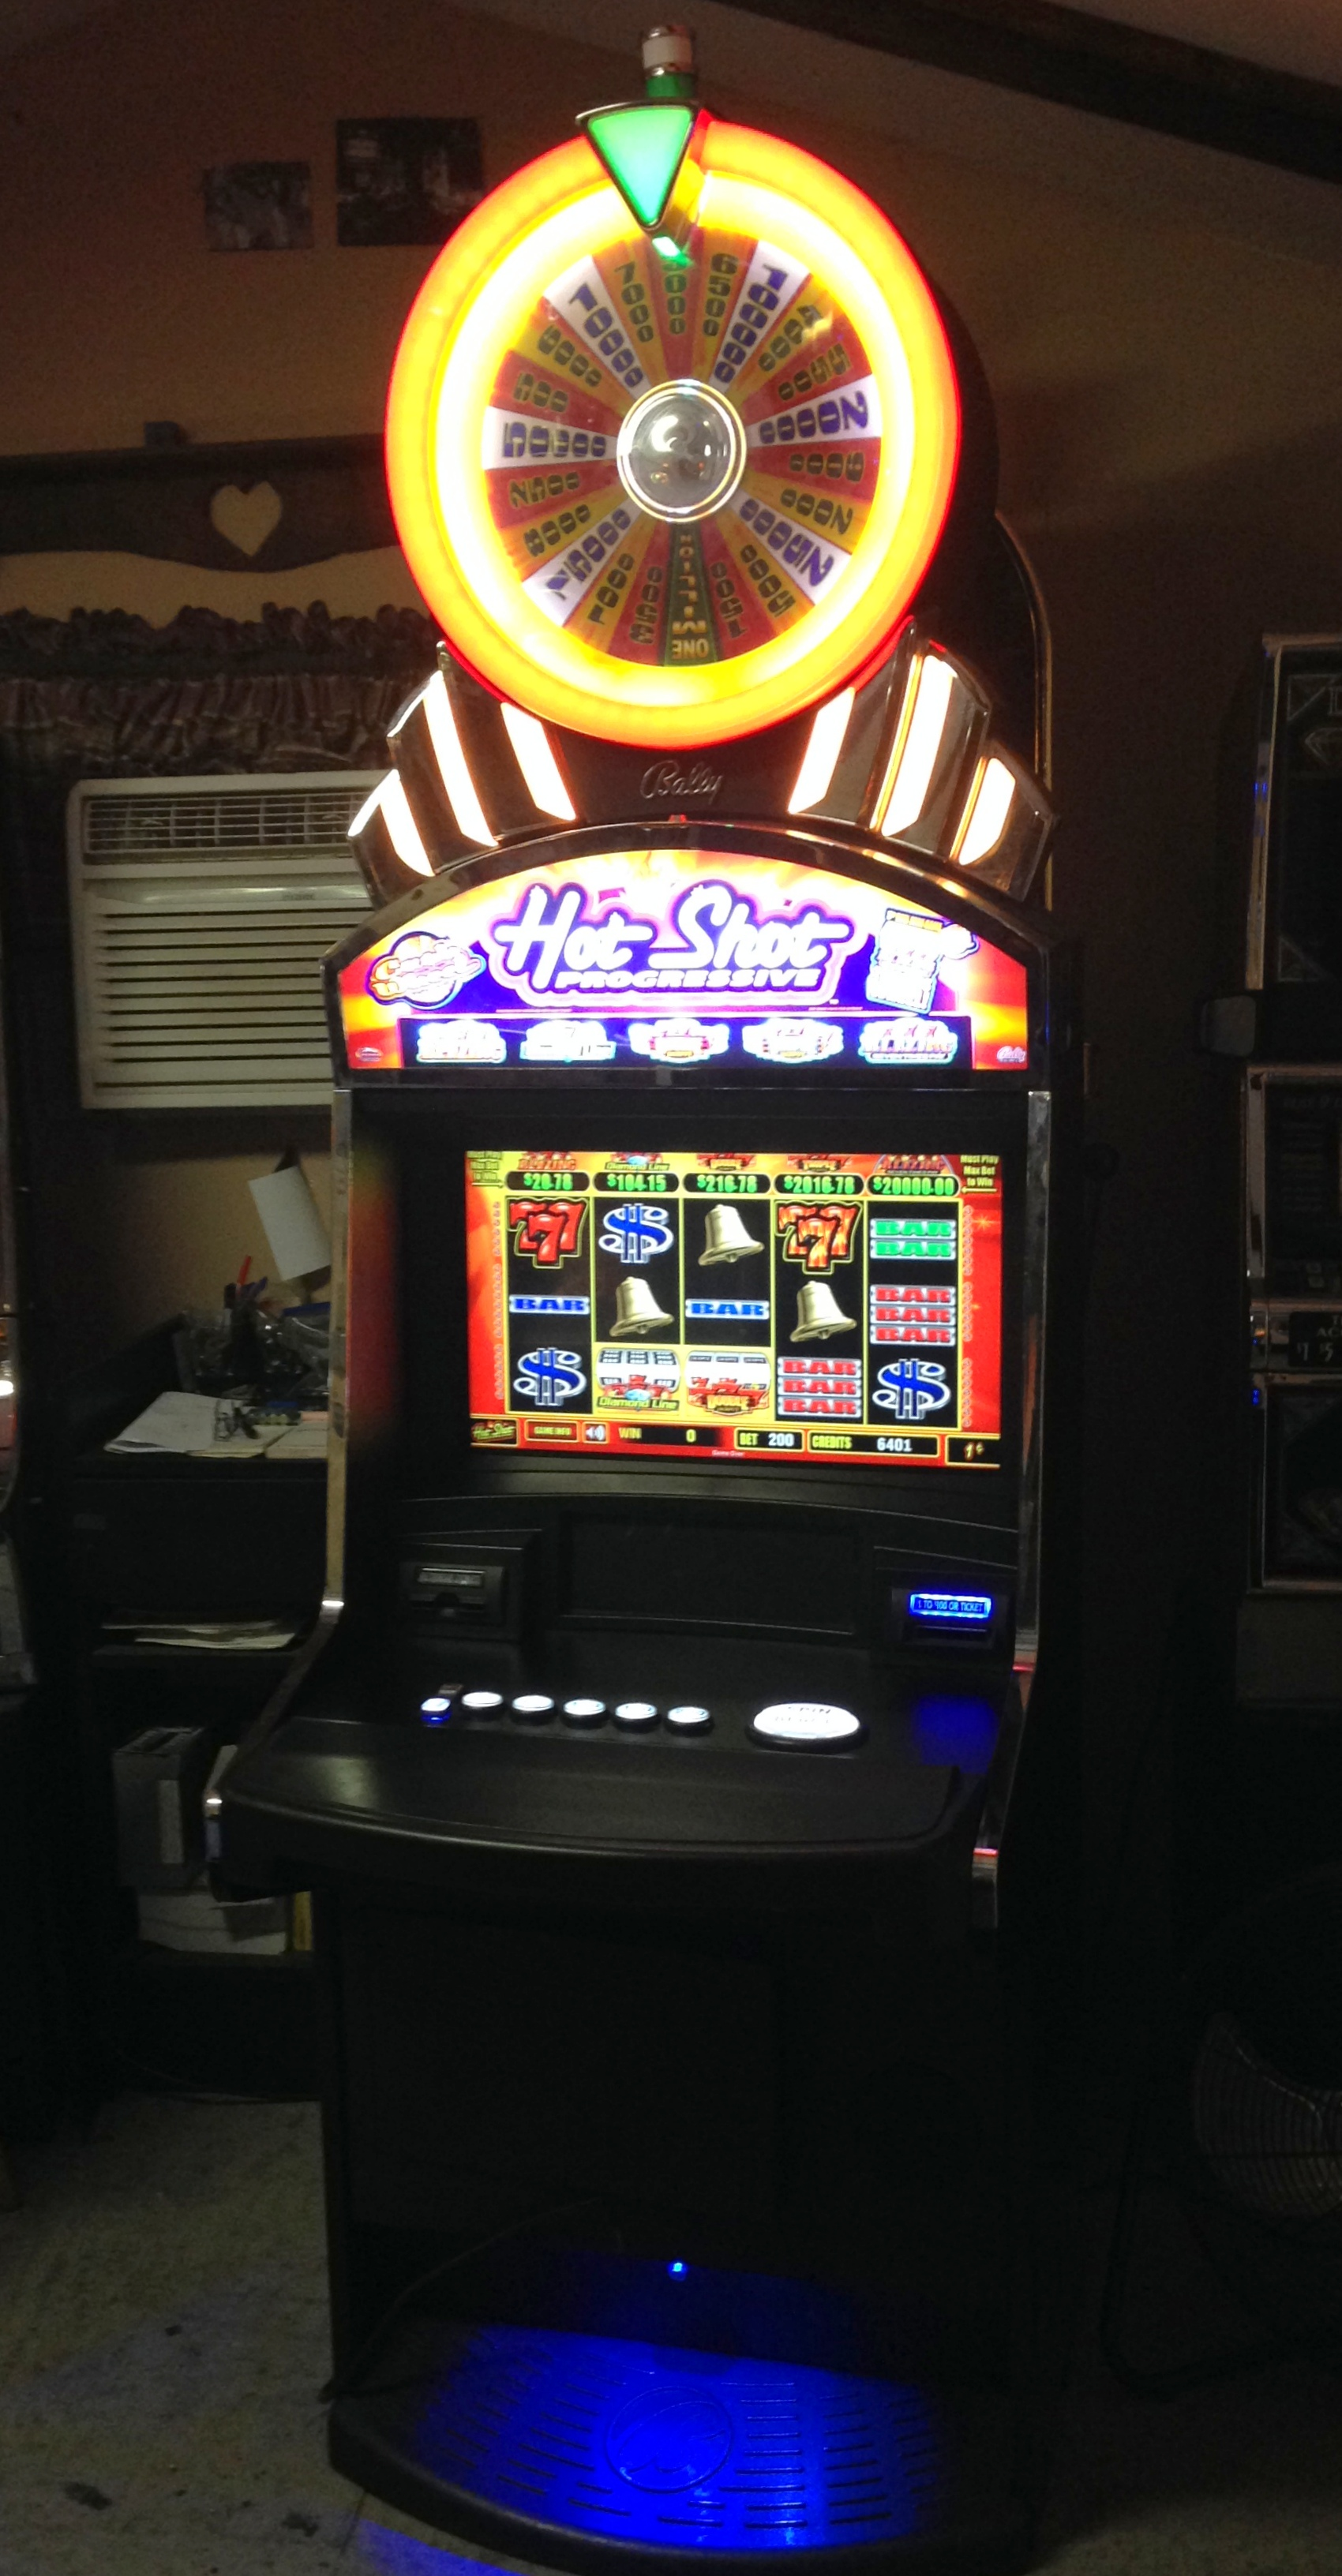 Club player casino codes